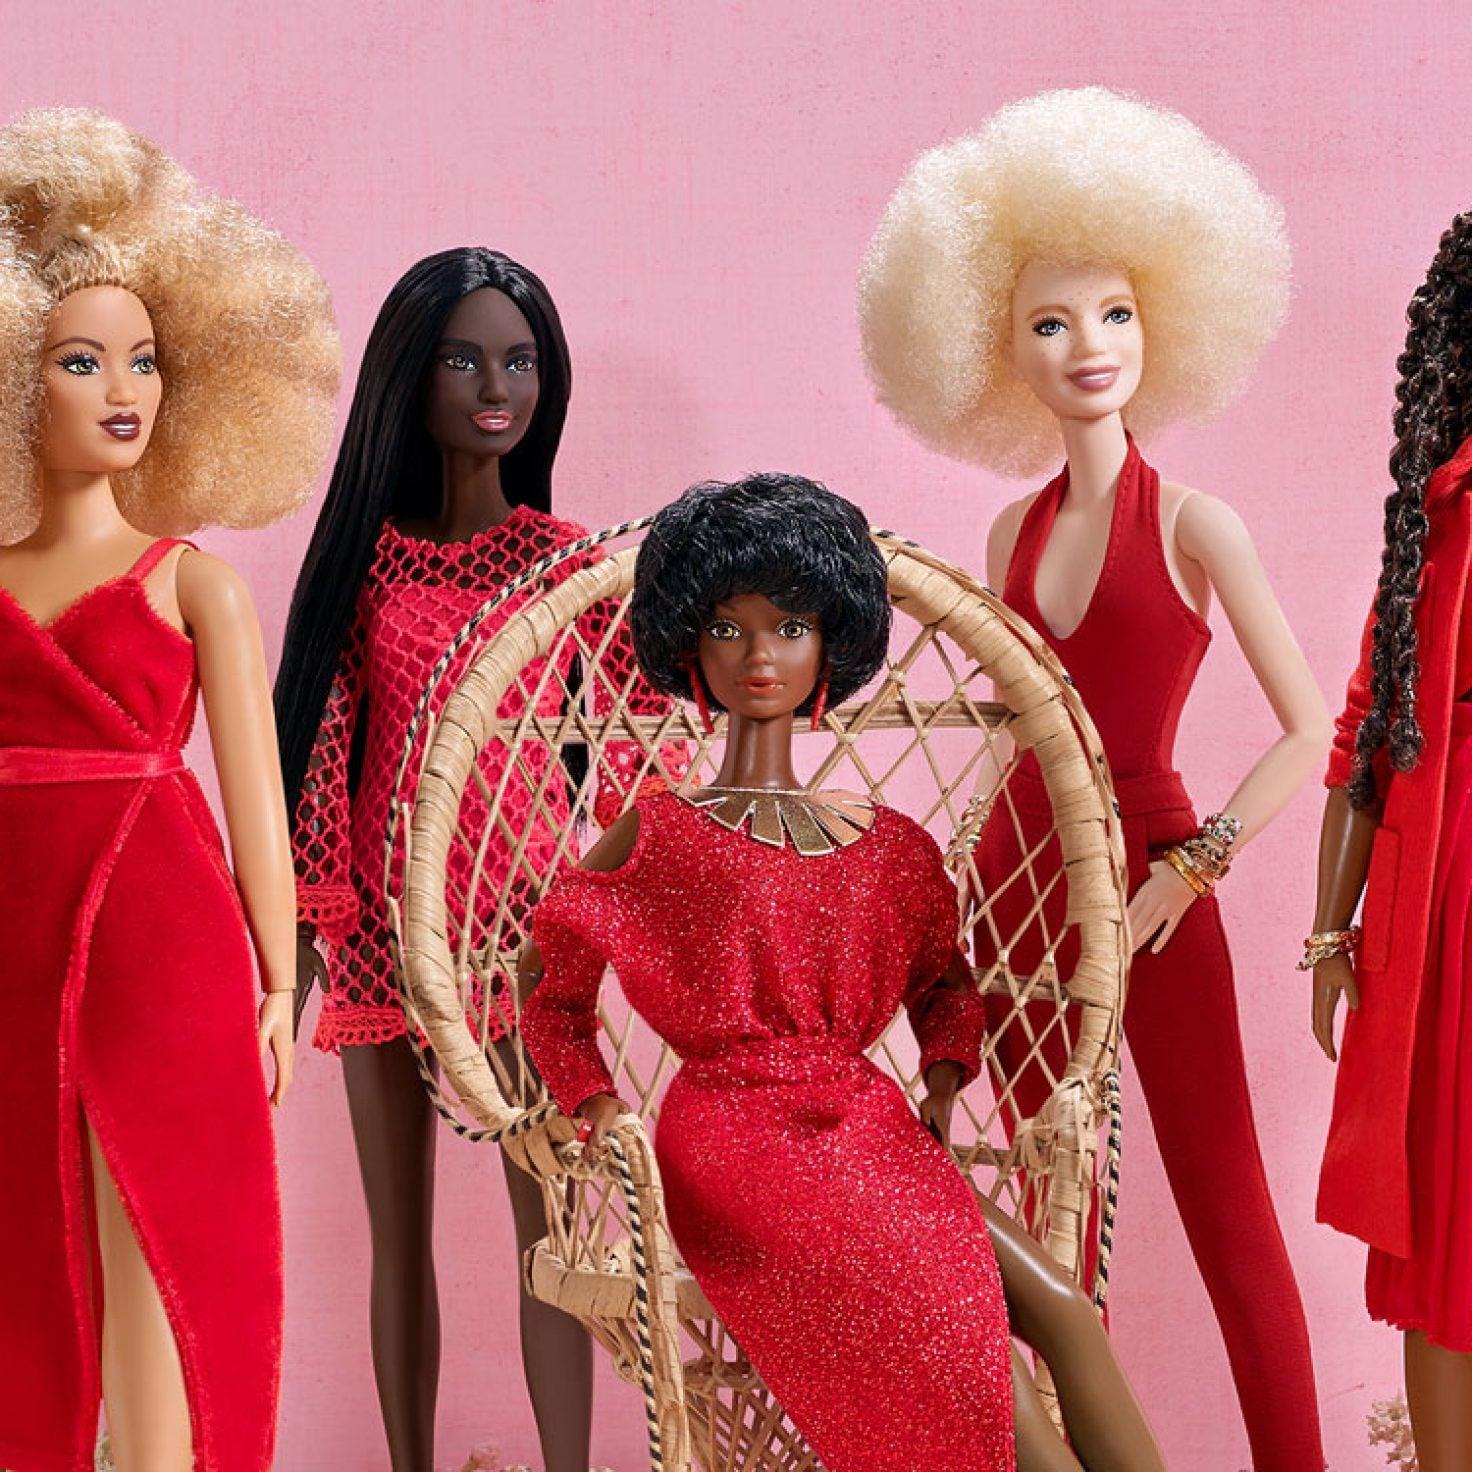 Costume Designer Shiona Turini Talks Her New Barbie Collaboration